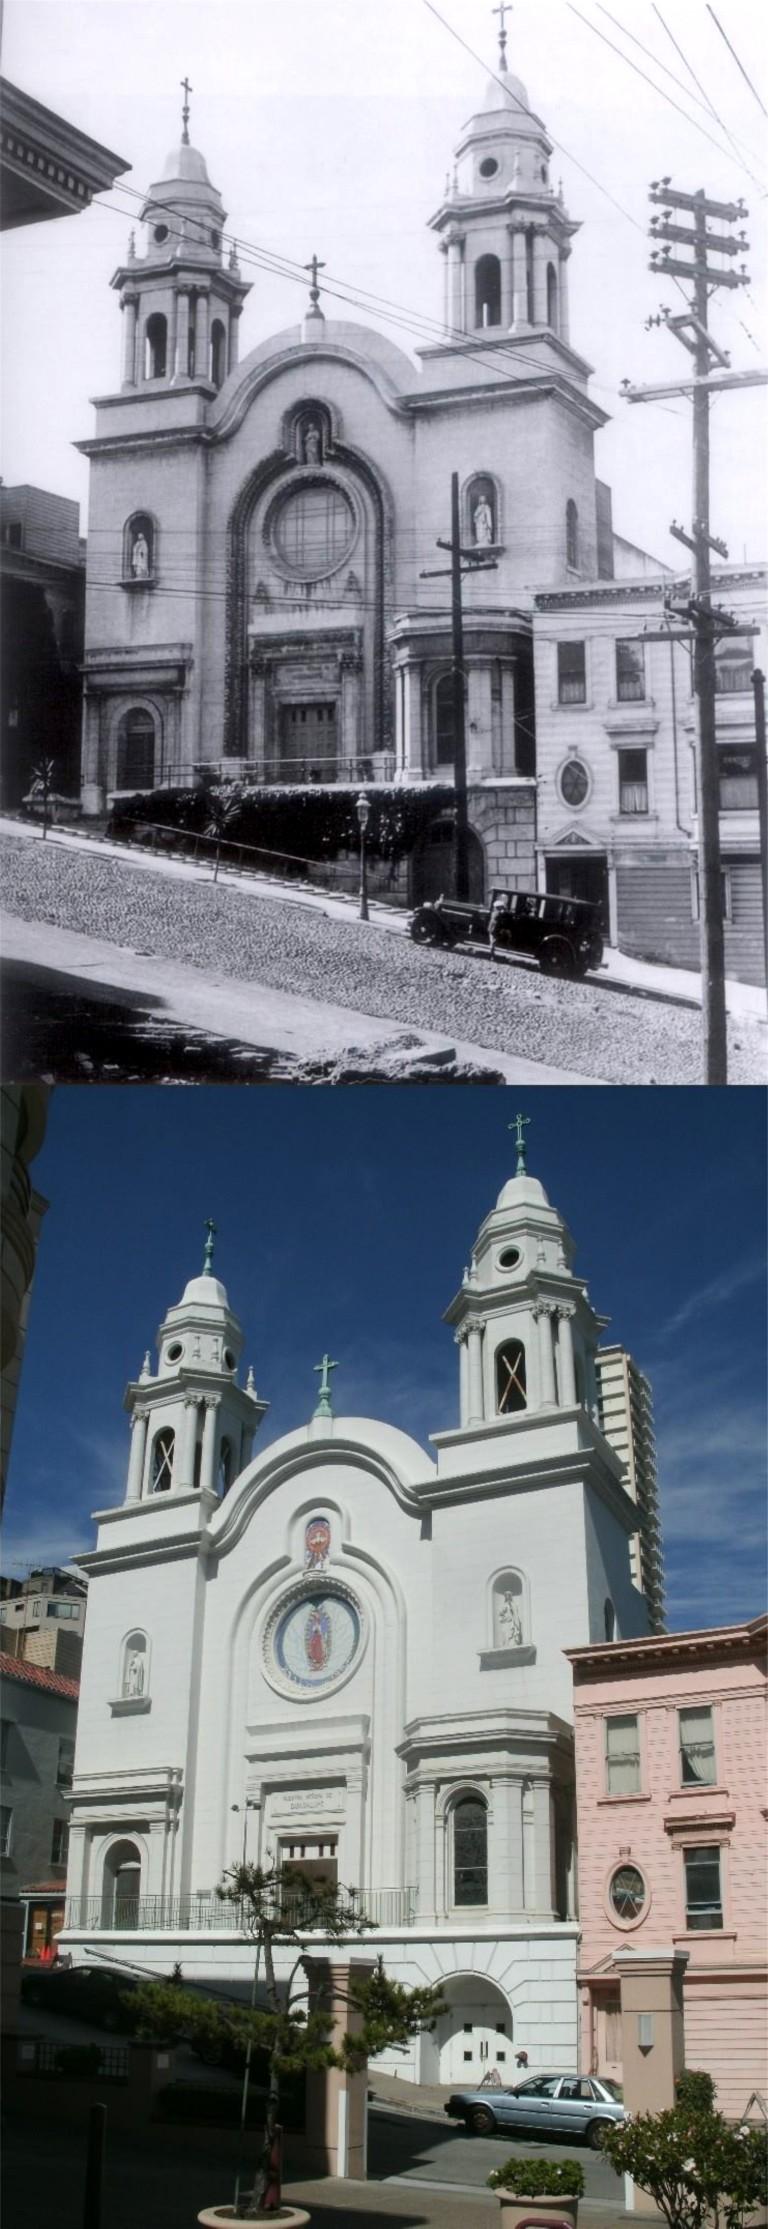 churchuse